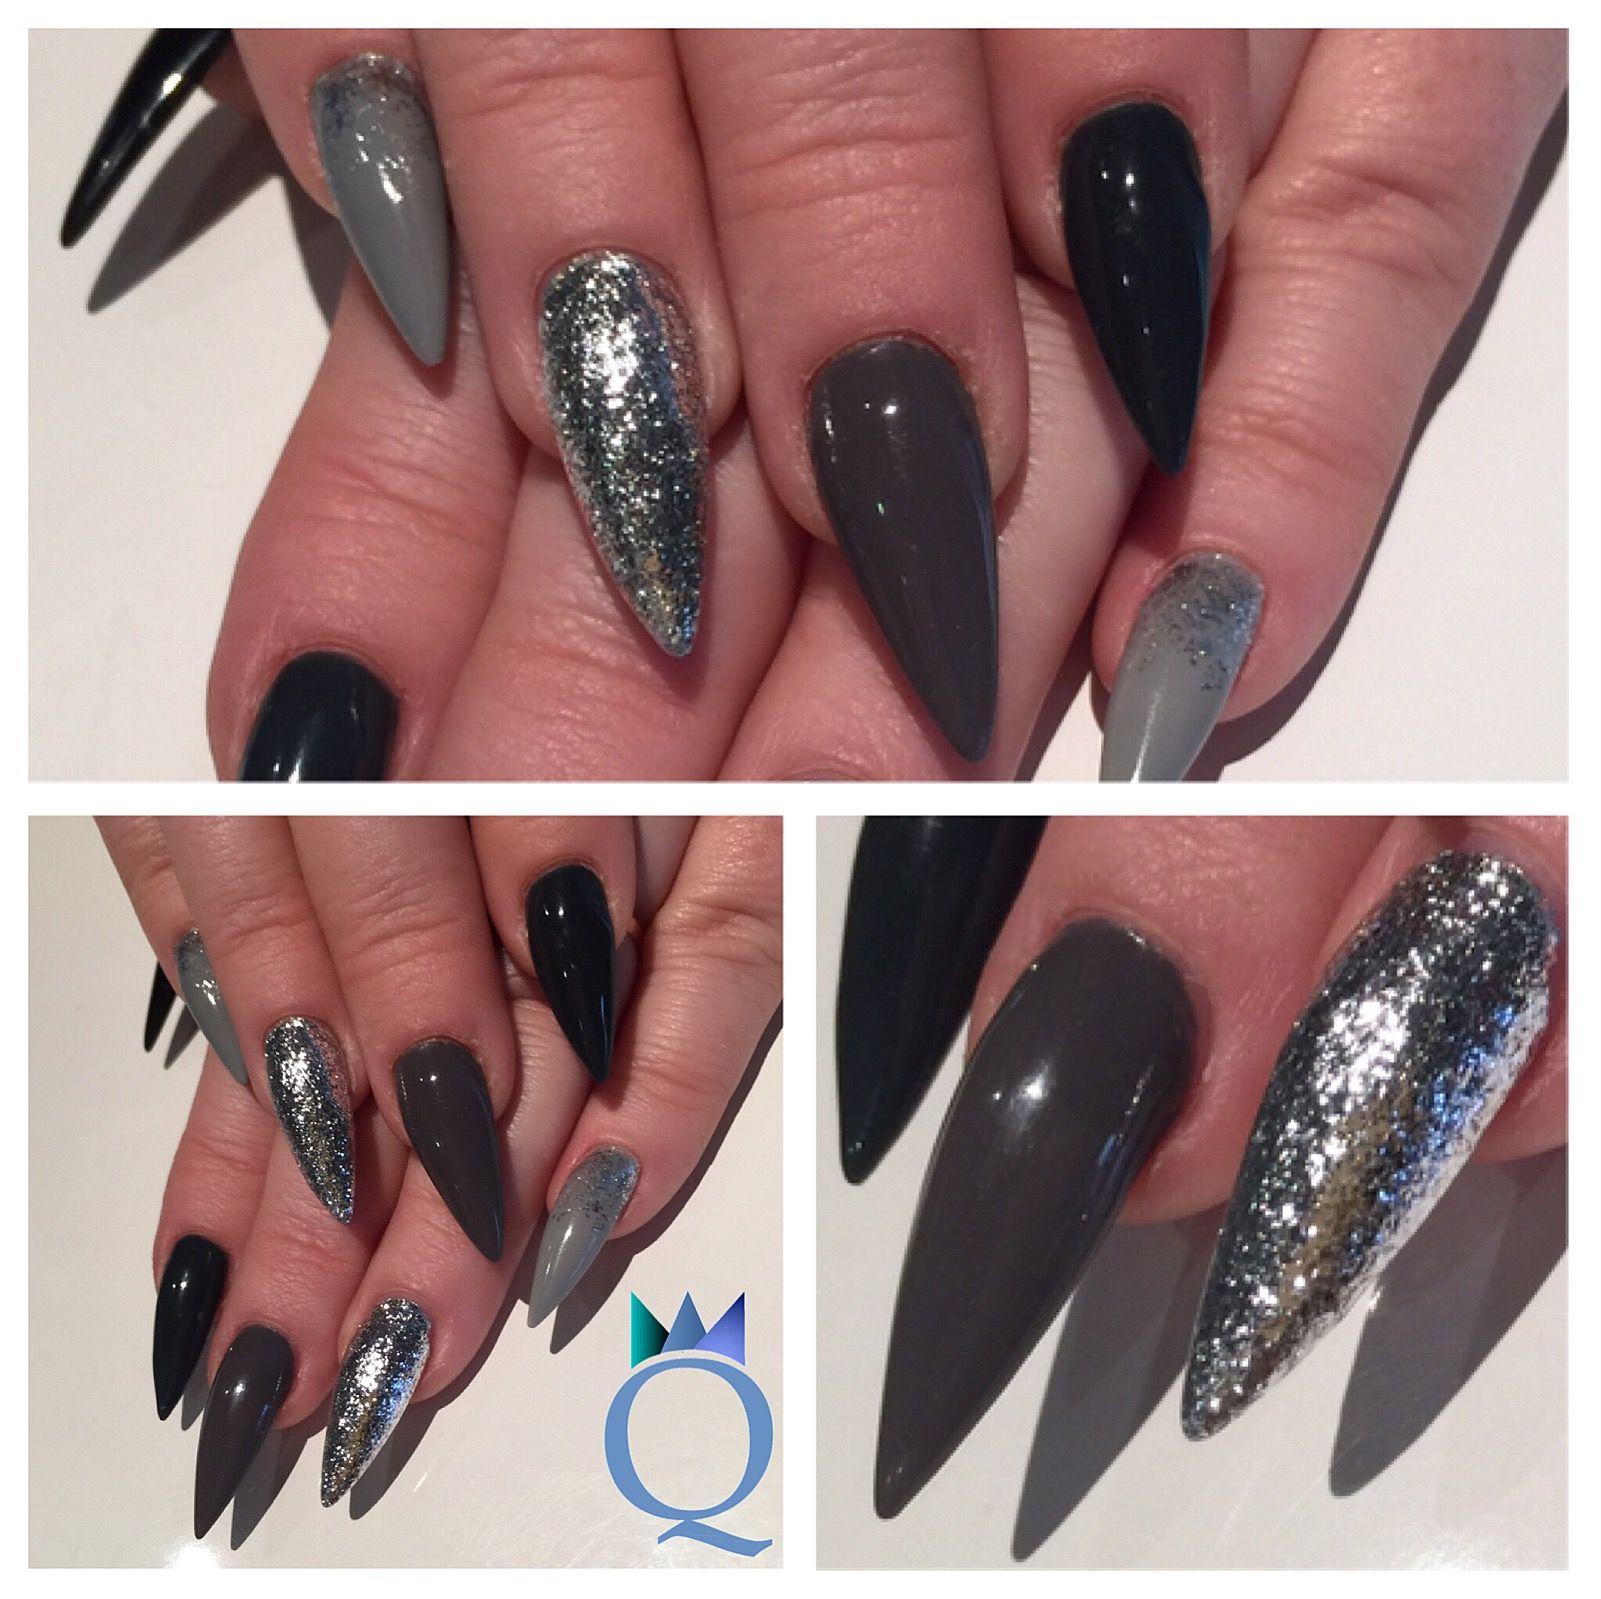 stilettonails #gelnails #nails #grey #silver #stiletto #gelnägel ...